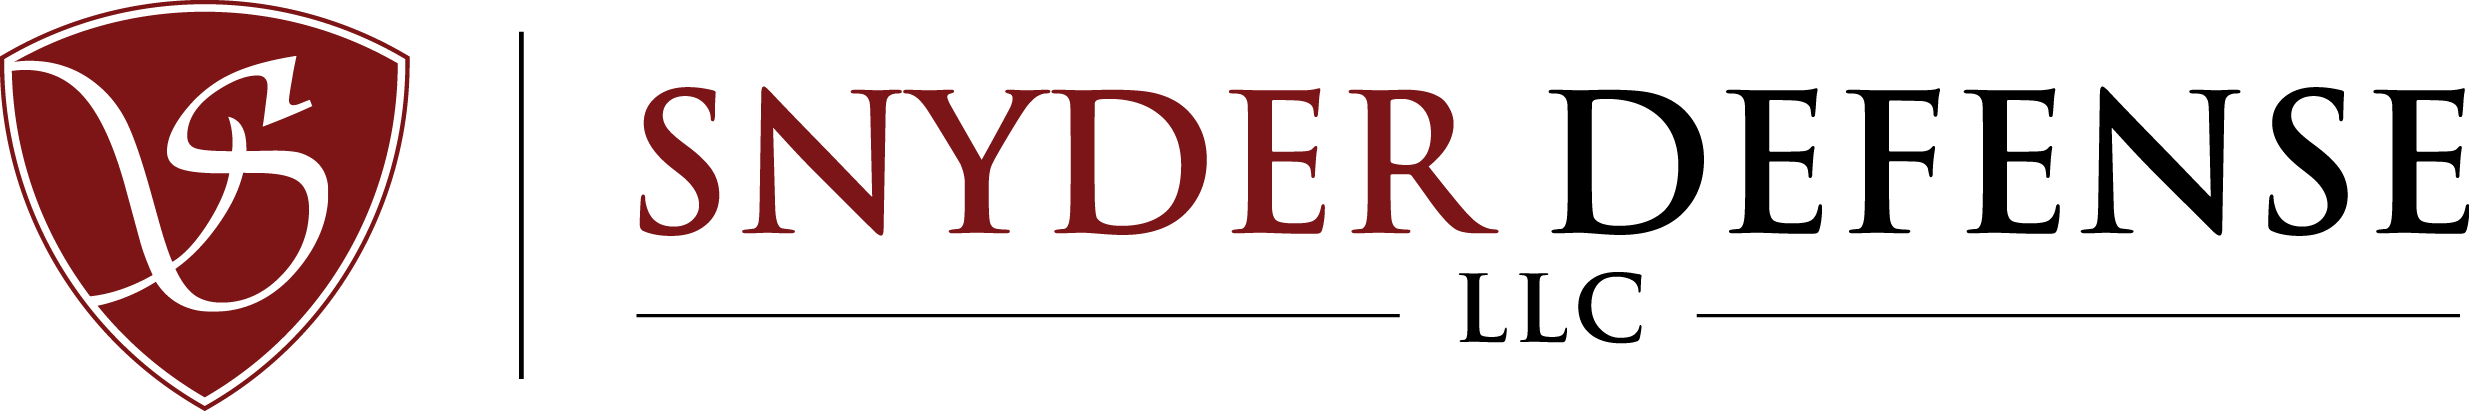 Snyder Defense, LLC